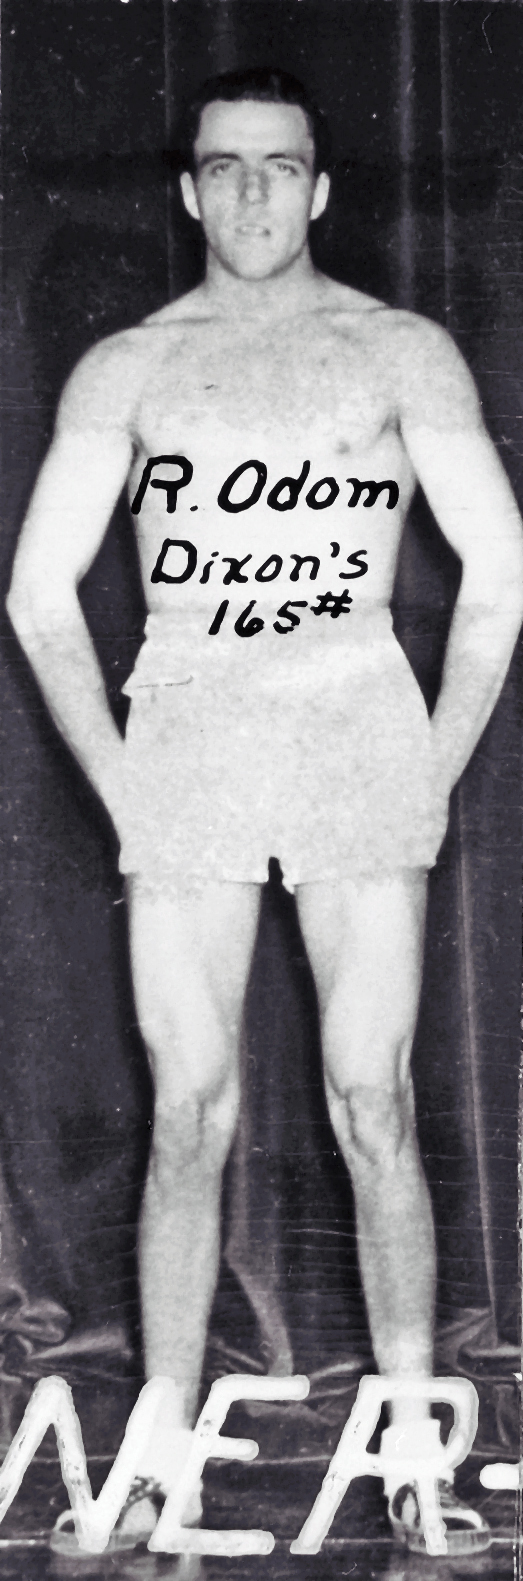 Boxing, Runner Up, 165 lb. Class Dixon's R. Odom